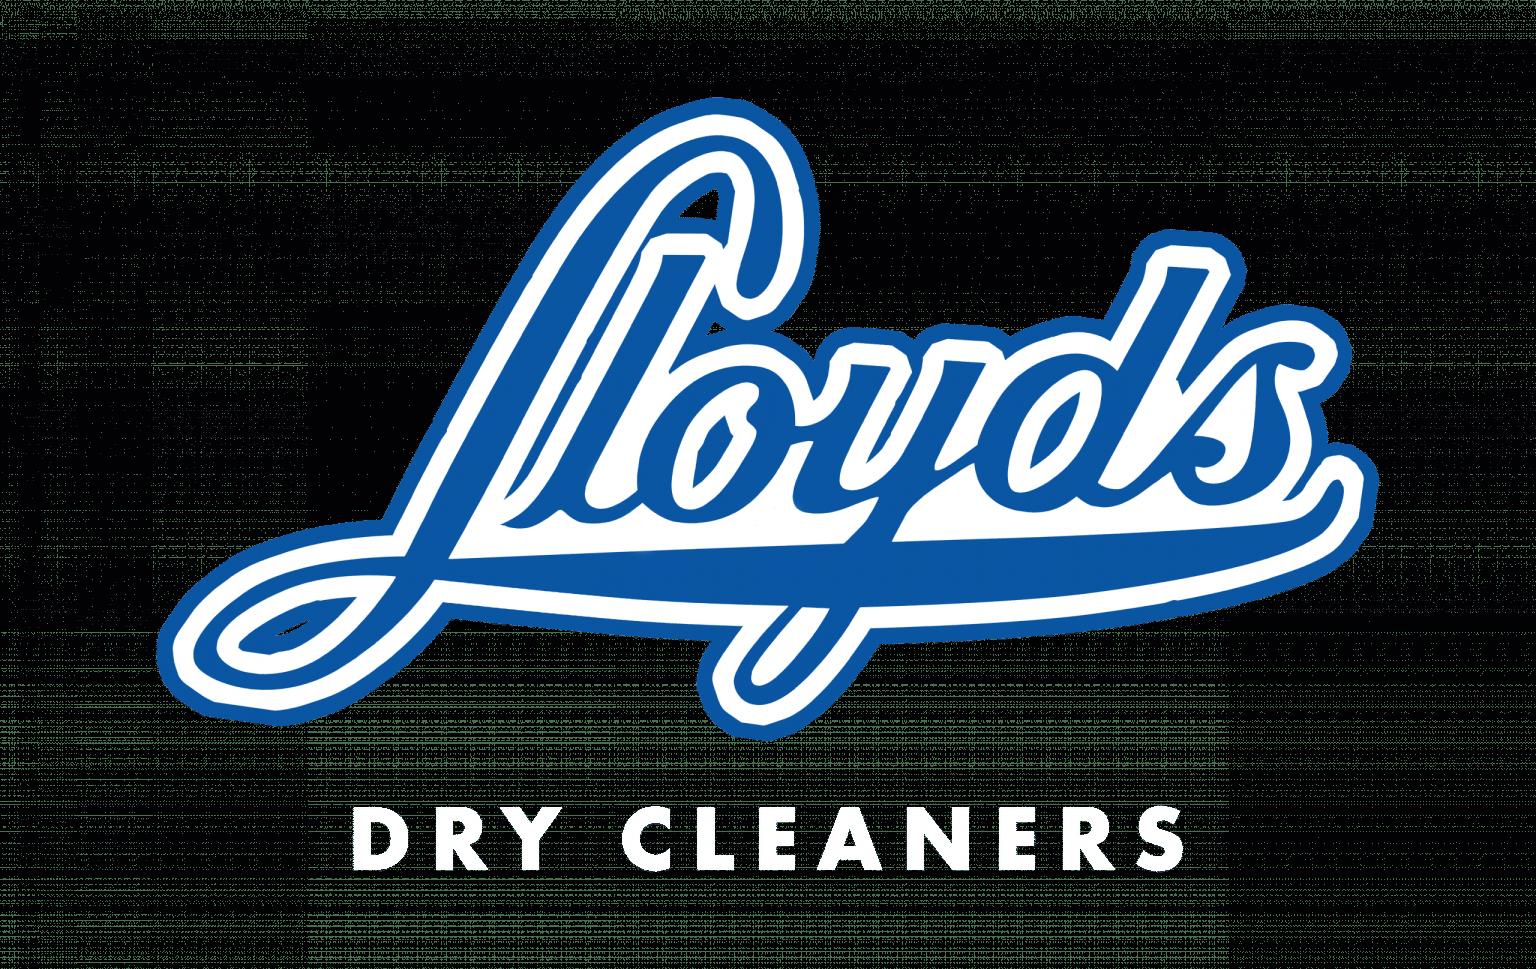 Lloyds Dry Cleaners - Logo